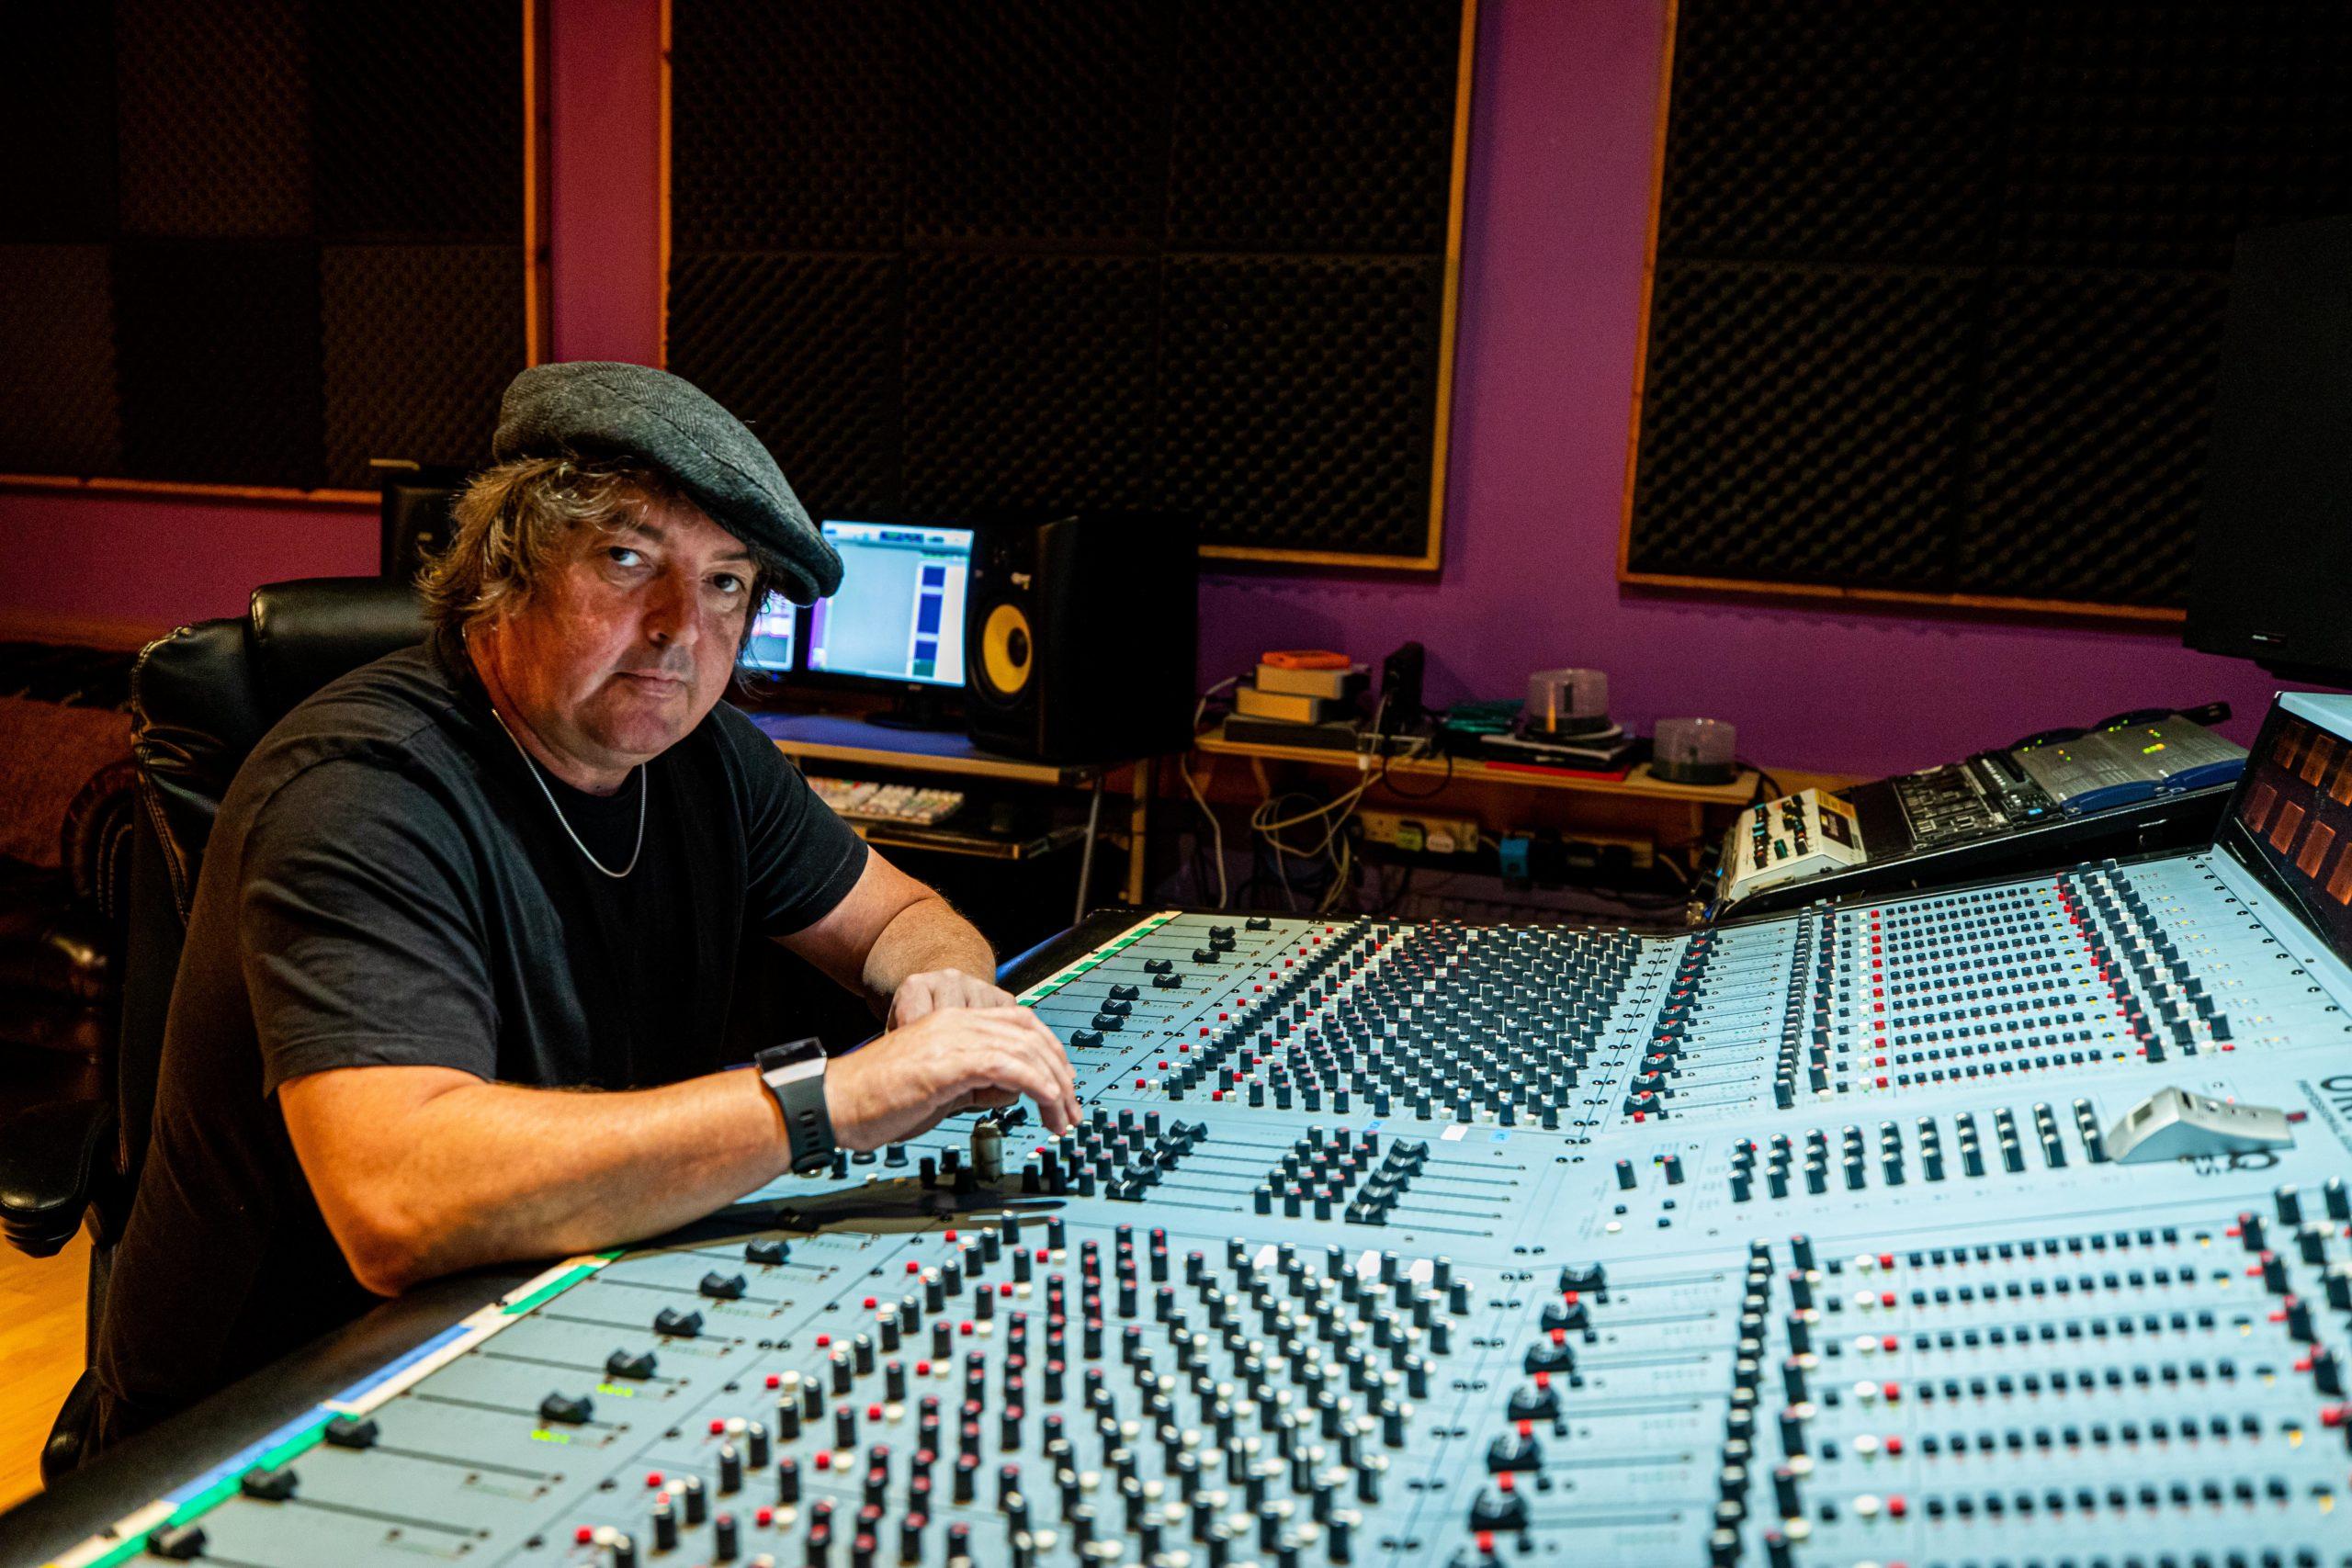 Michael Brennan in his Rosyth studio